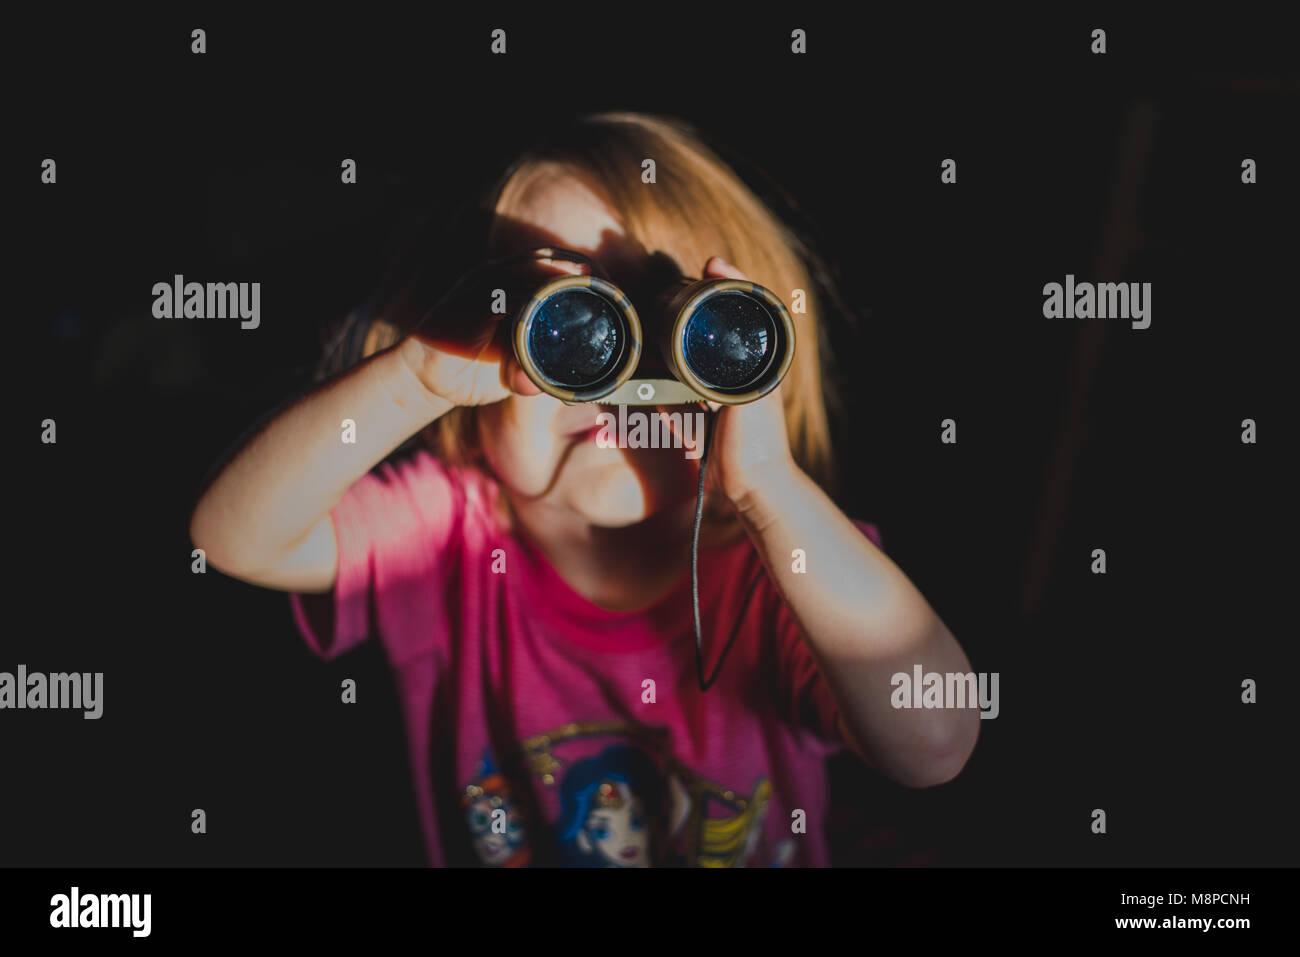 A young toddler girl looking through binoculars. Stock Photo